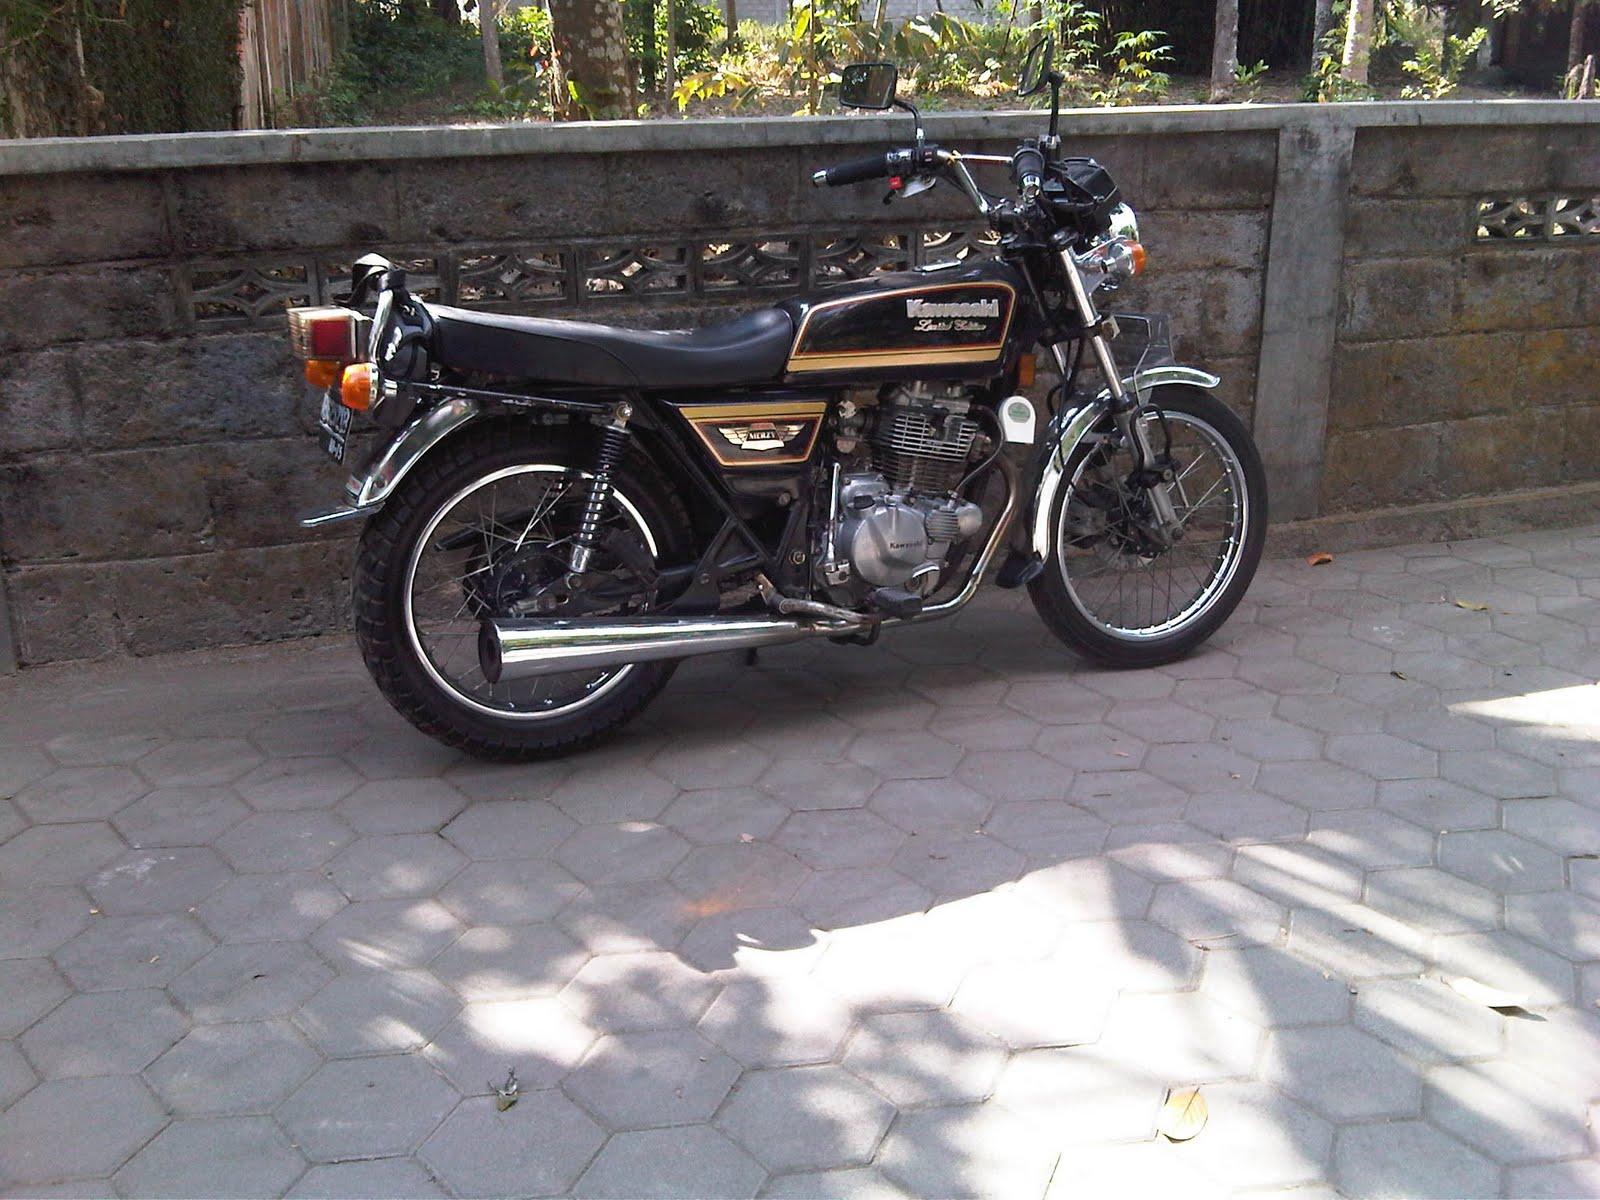 Modifikasi Kawasaki Binter Merzy KZ200  Classic and